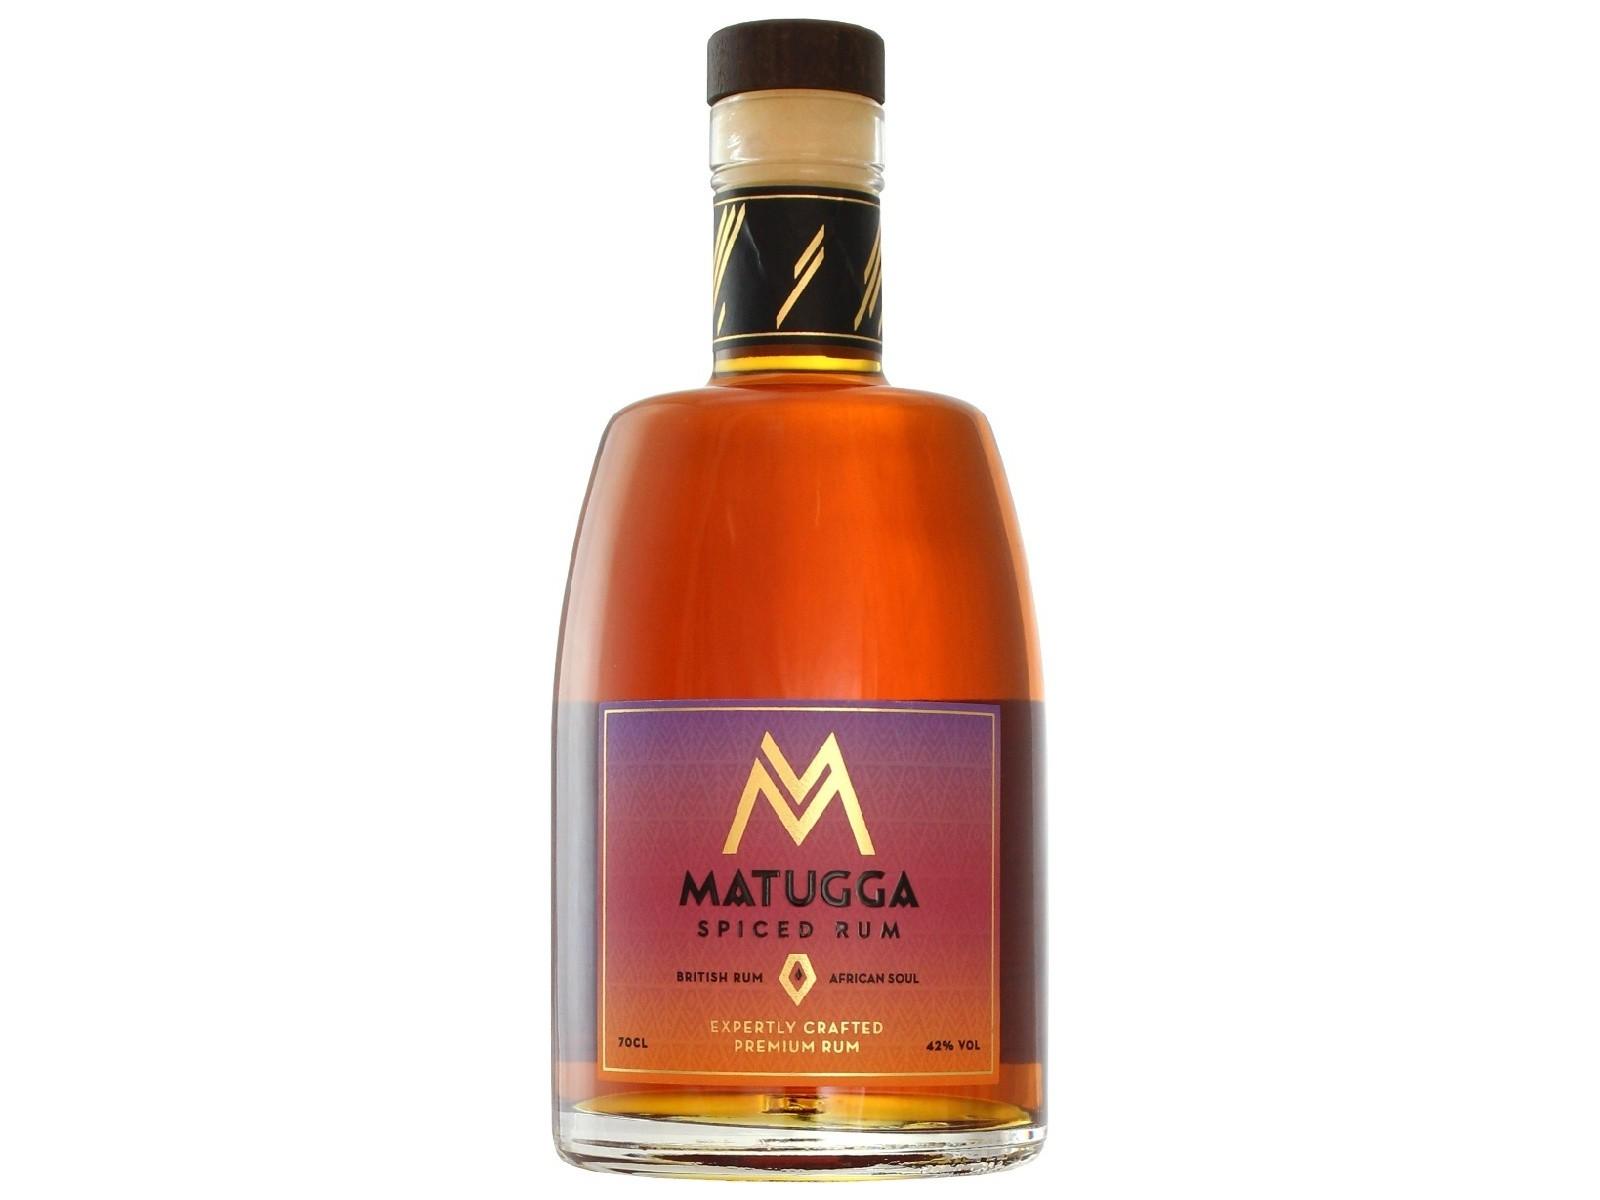 Mattuga Rum Matugga / Spiced Rum